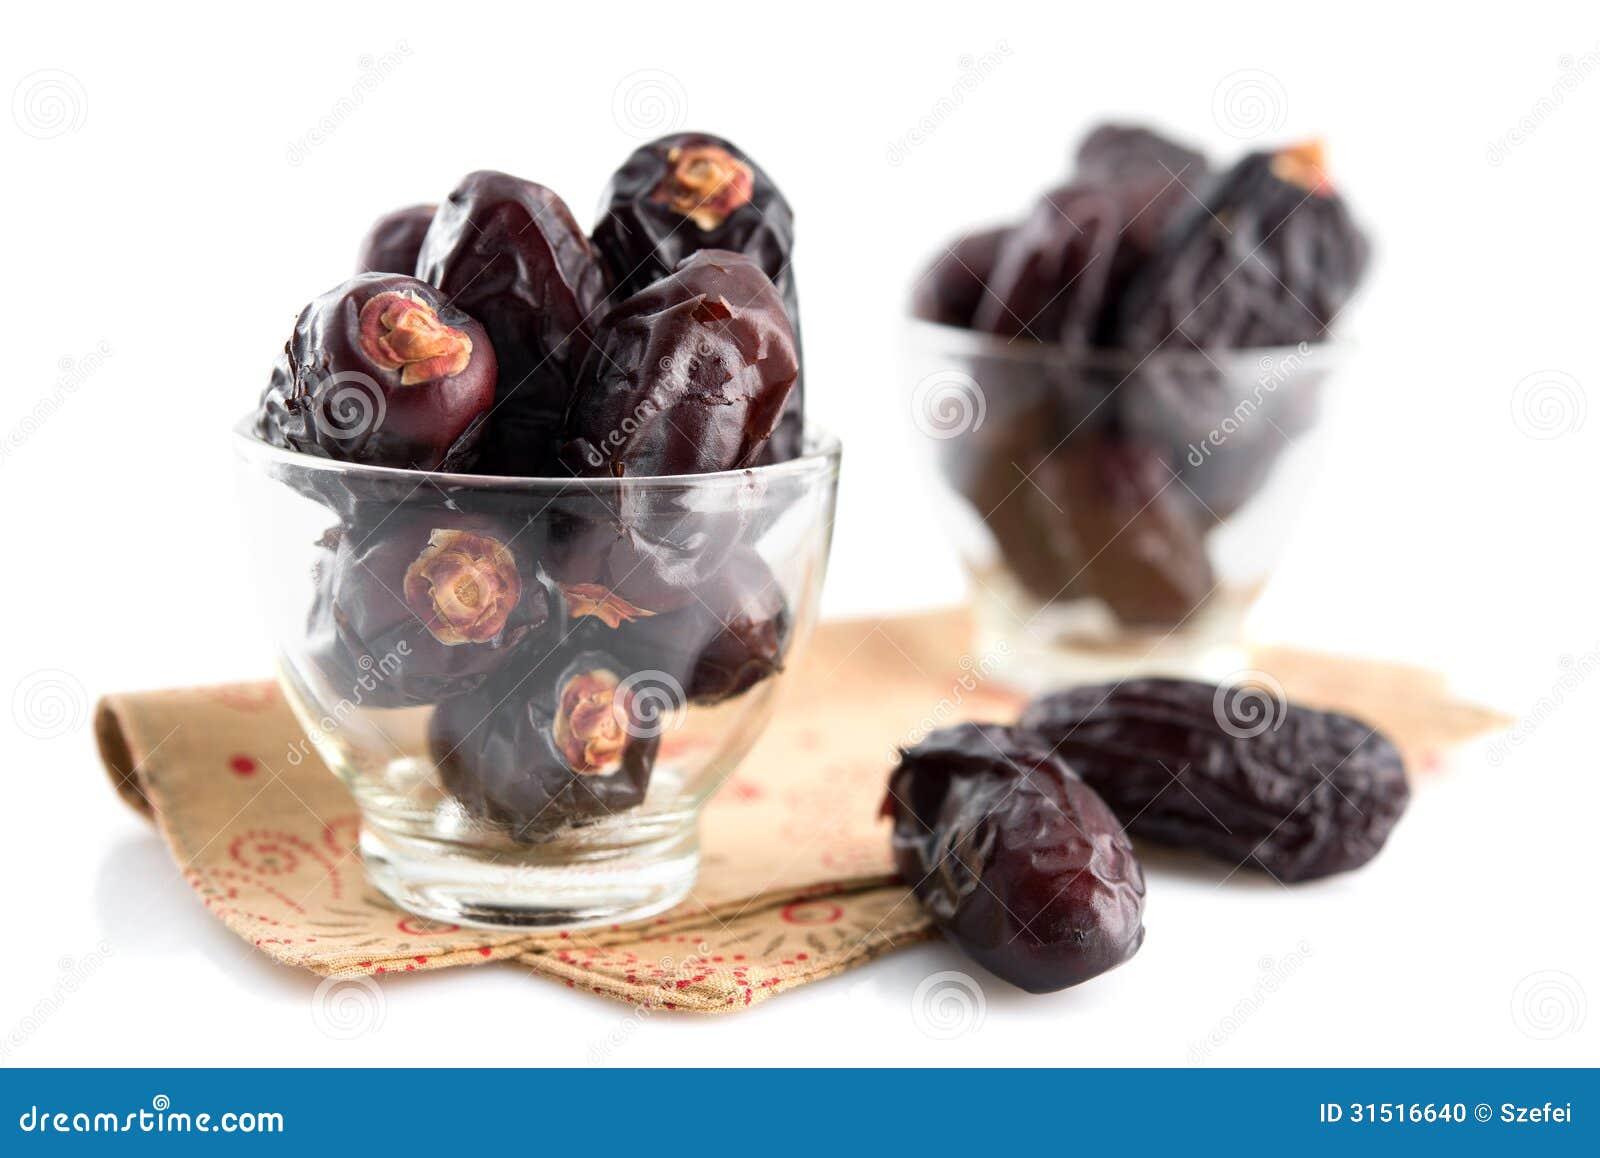 norsk dating side dates fruit